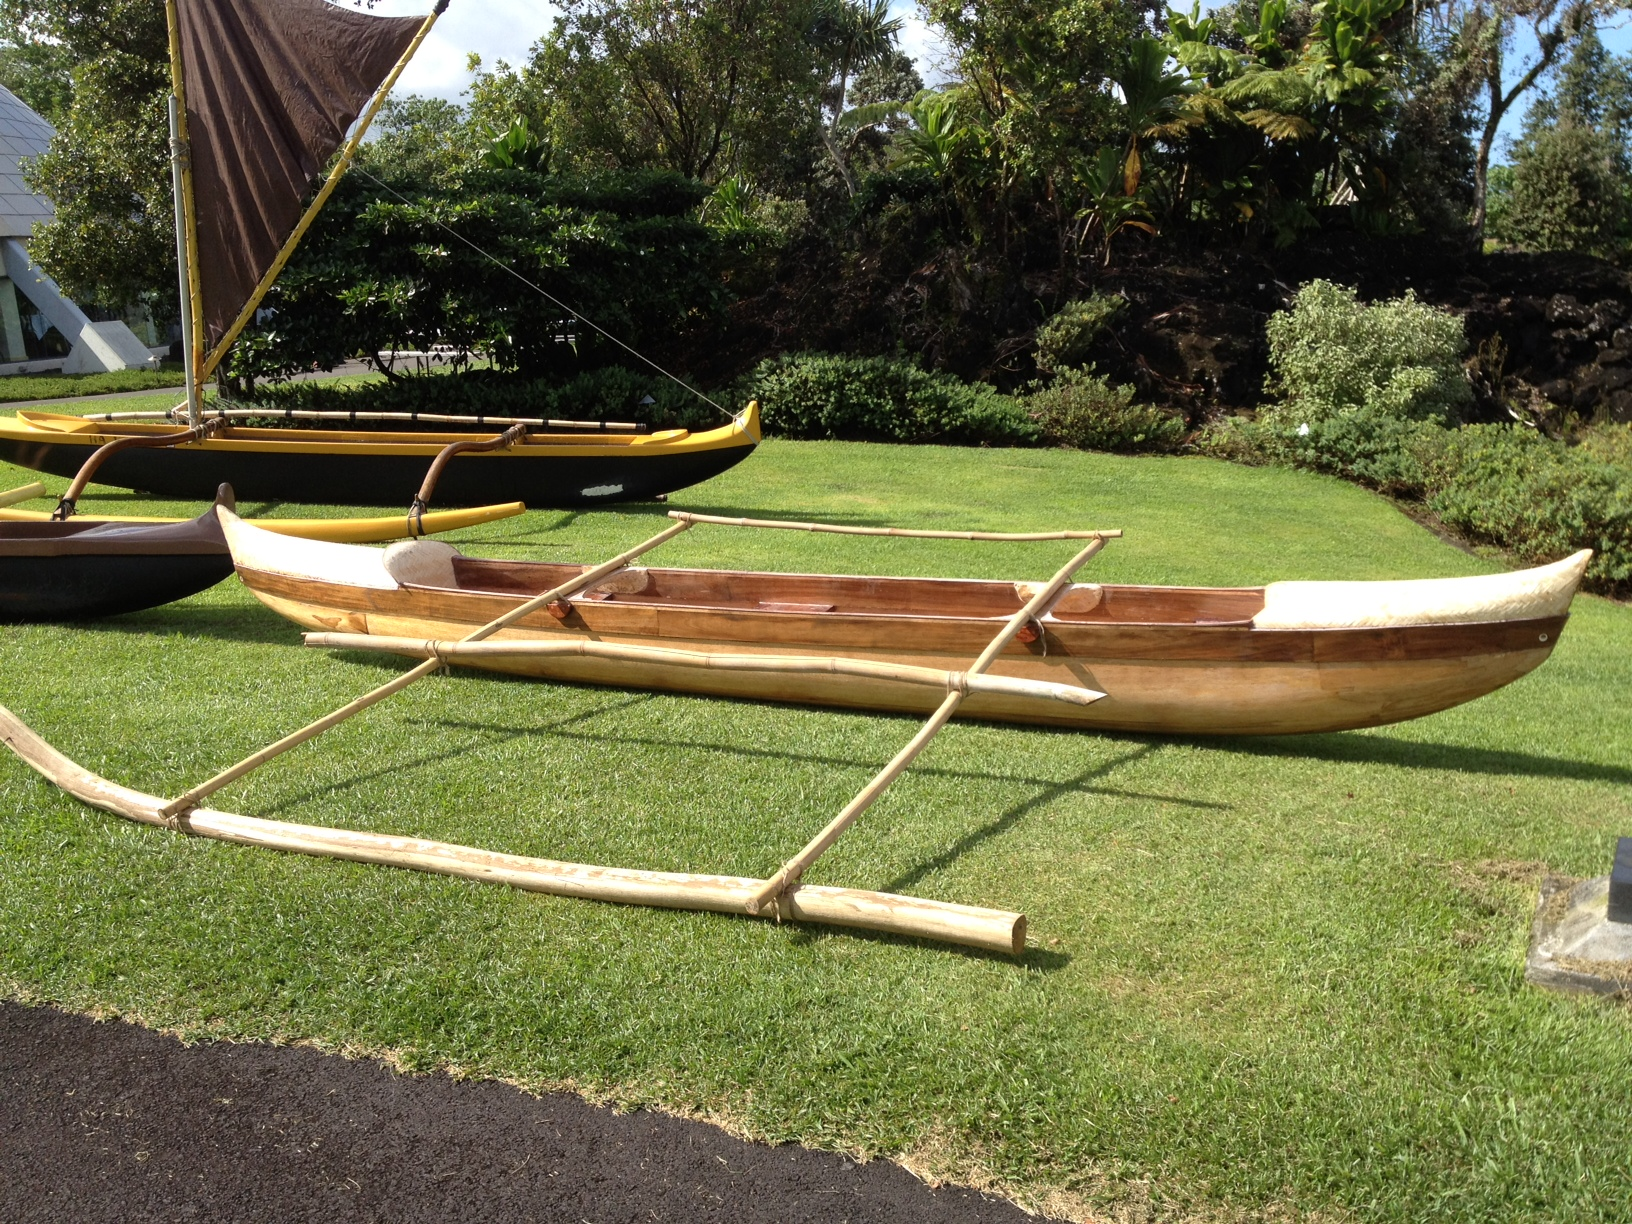 Imiloa canoe